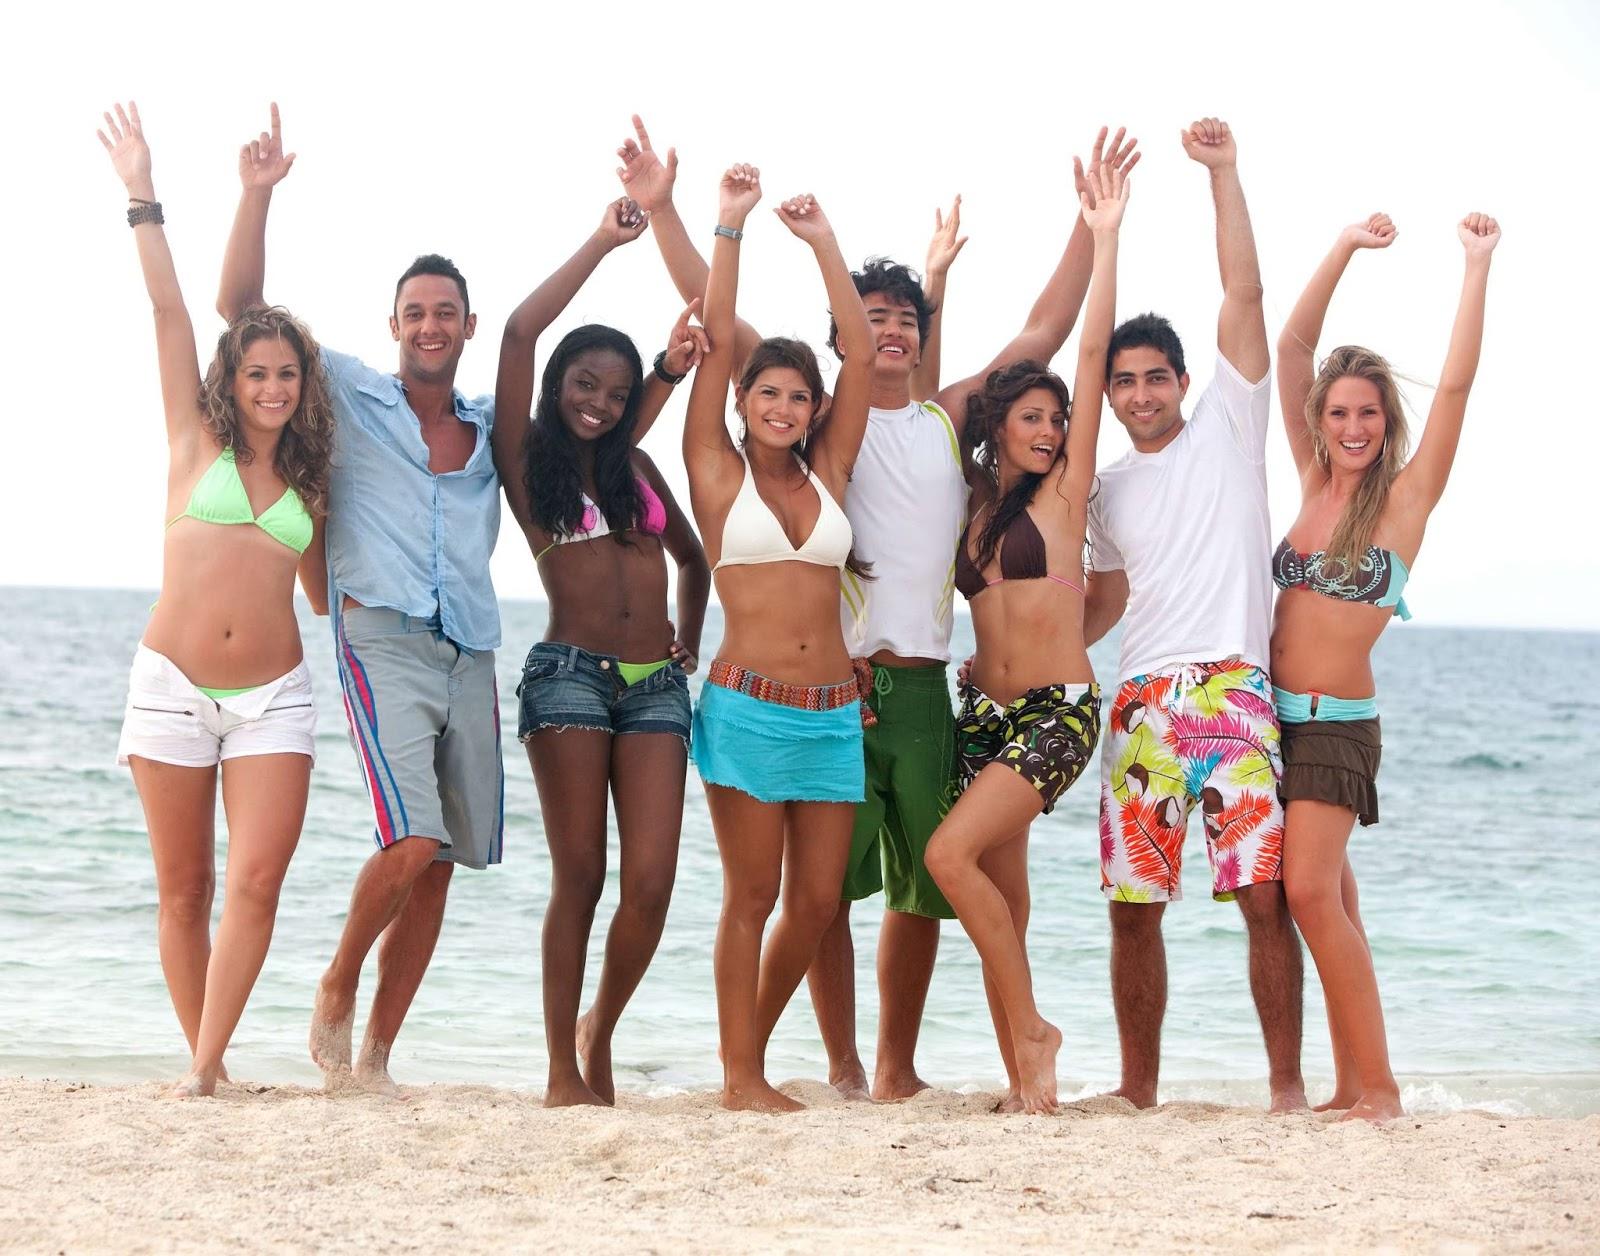 Beach singles delaware